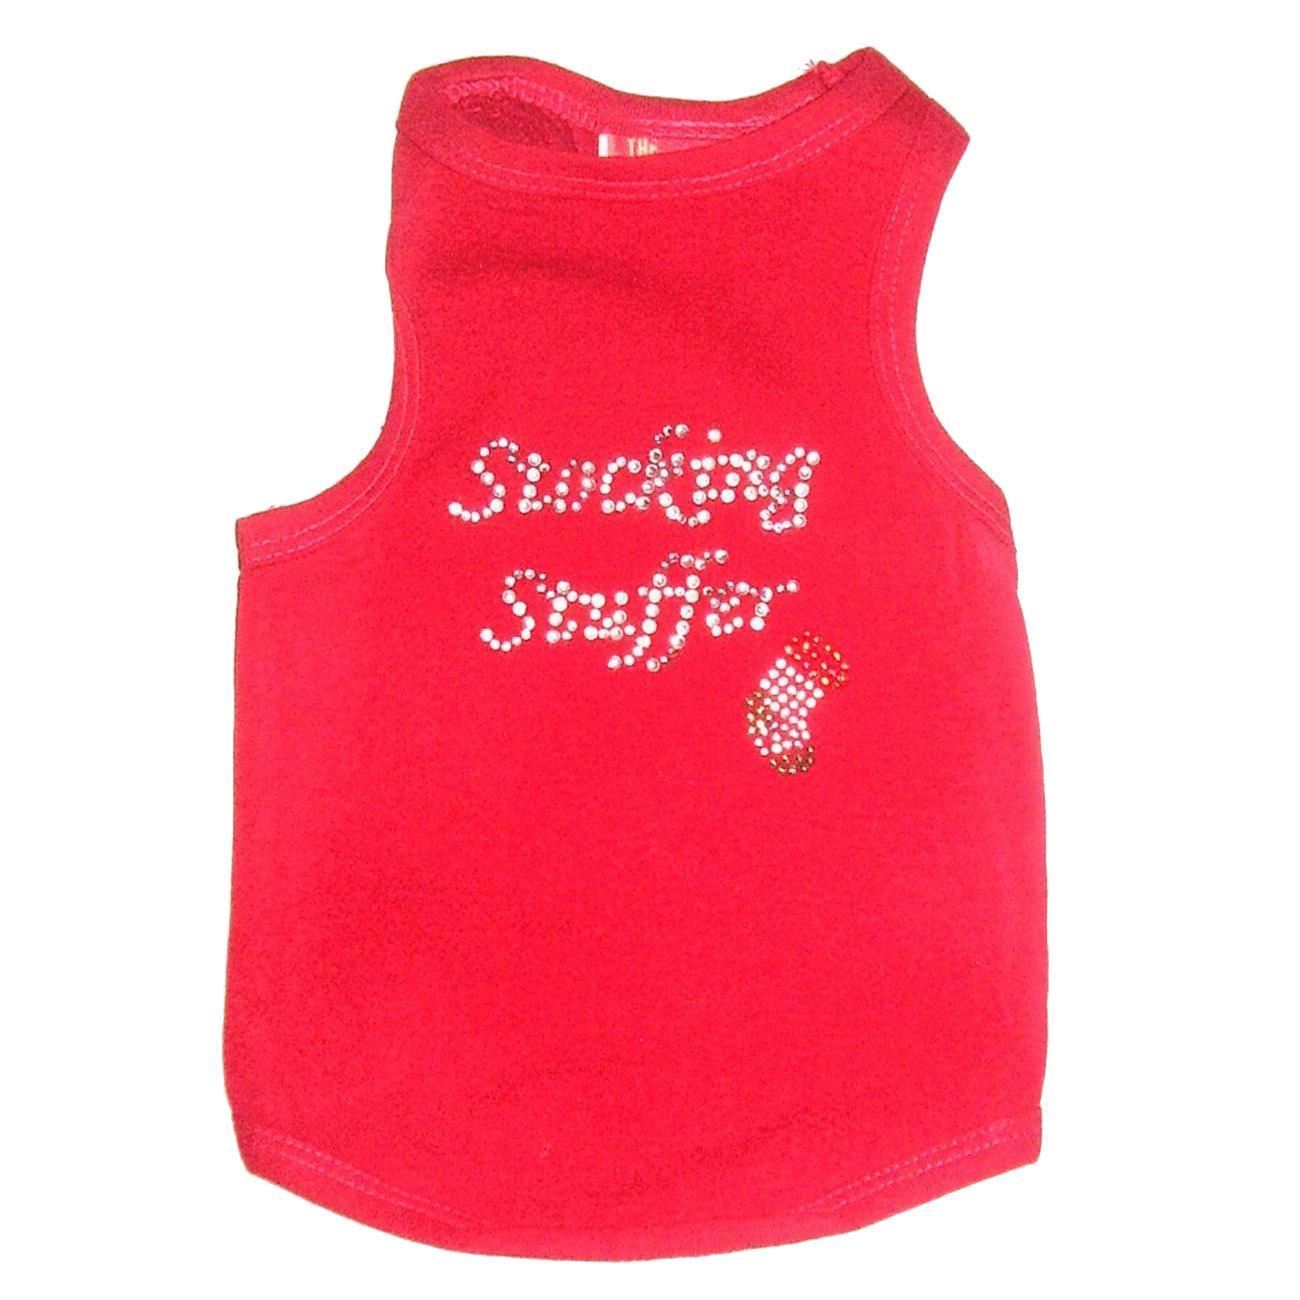 Stocking Stuffer Rhinestone Christmas Dog Tank - Red